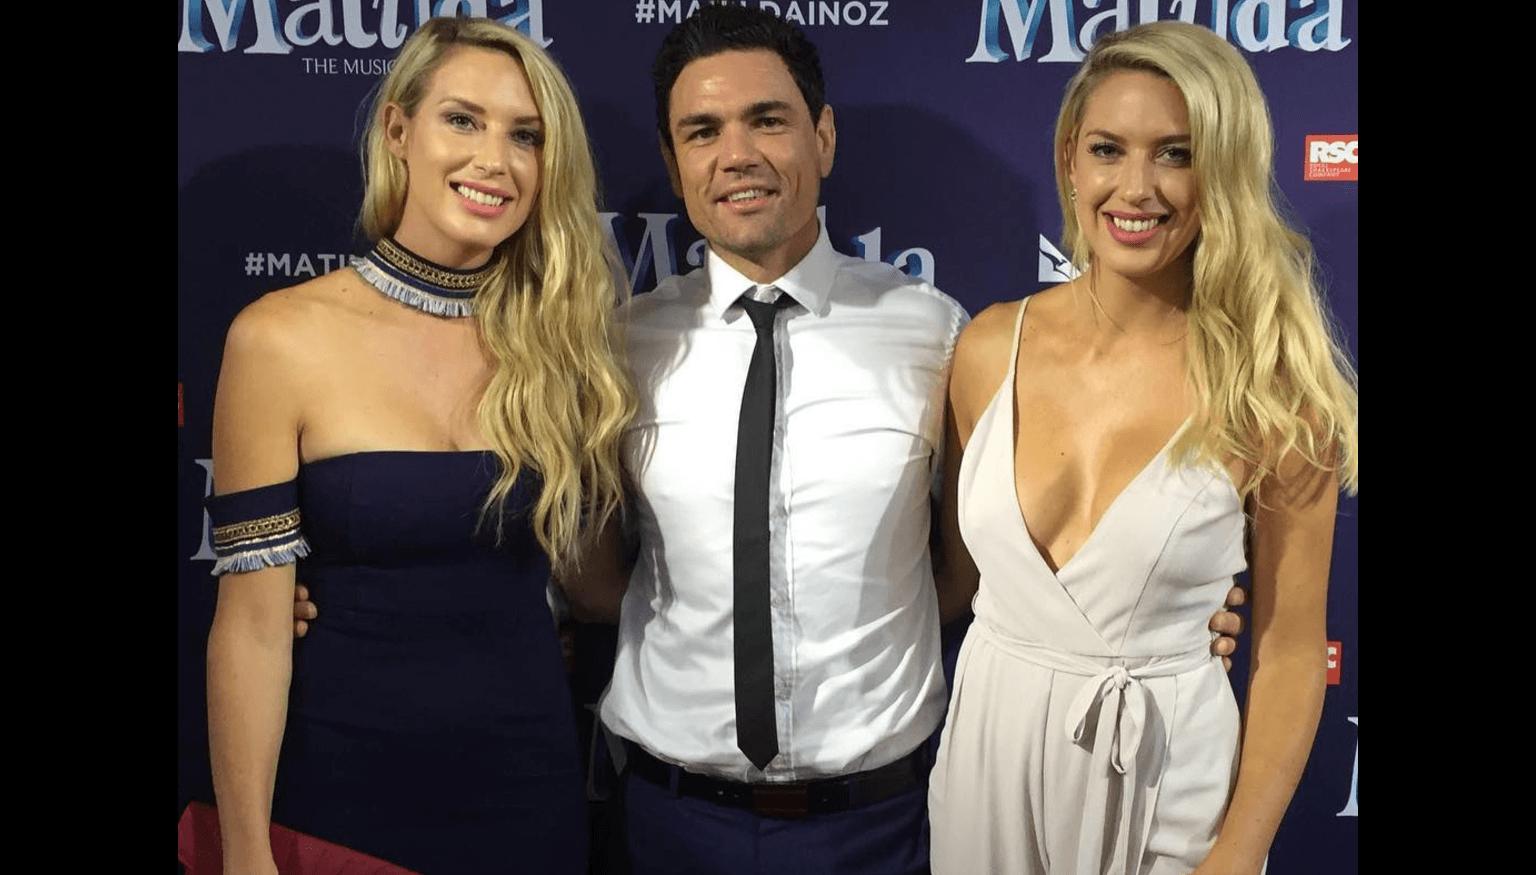 Photos Mish Marsh nude photos 2019